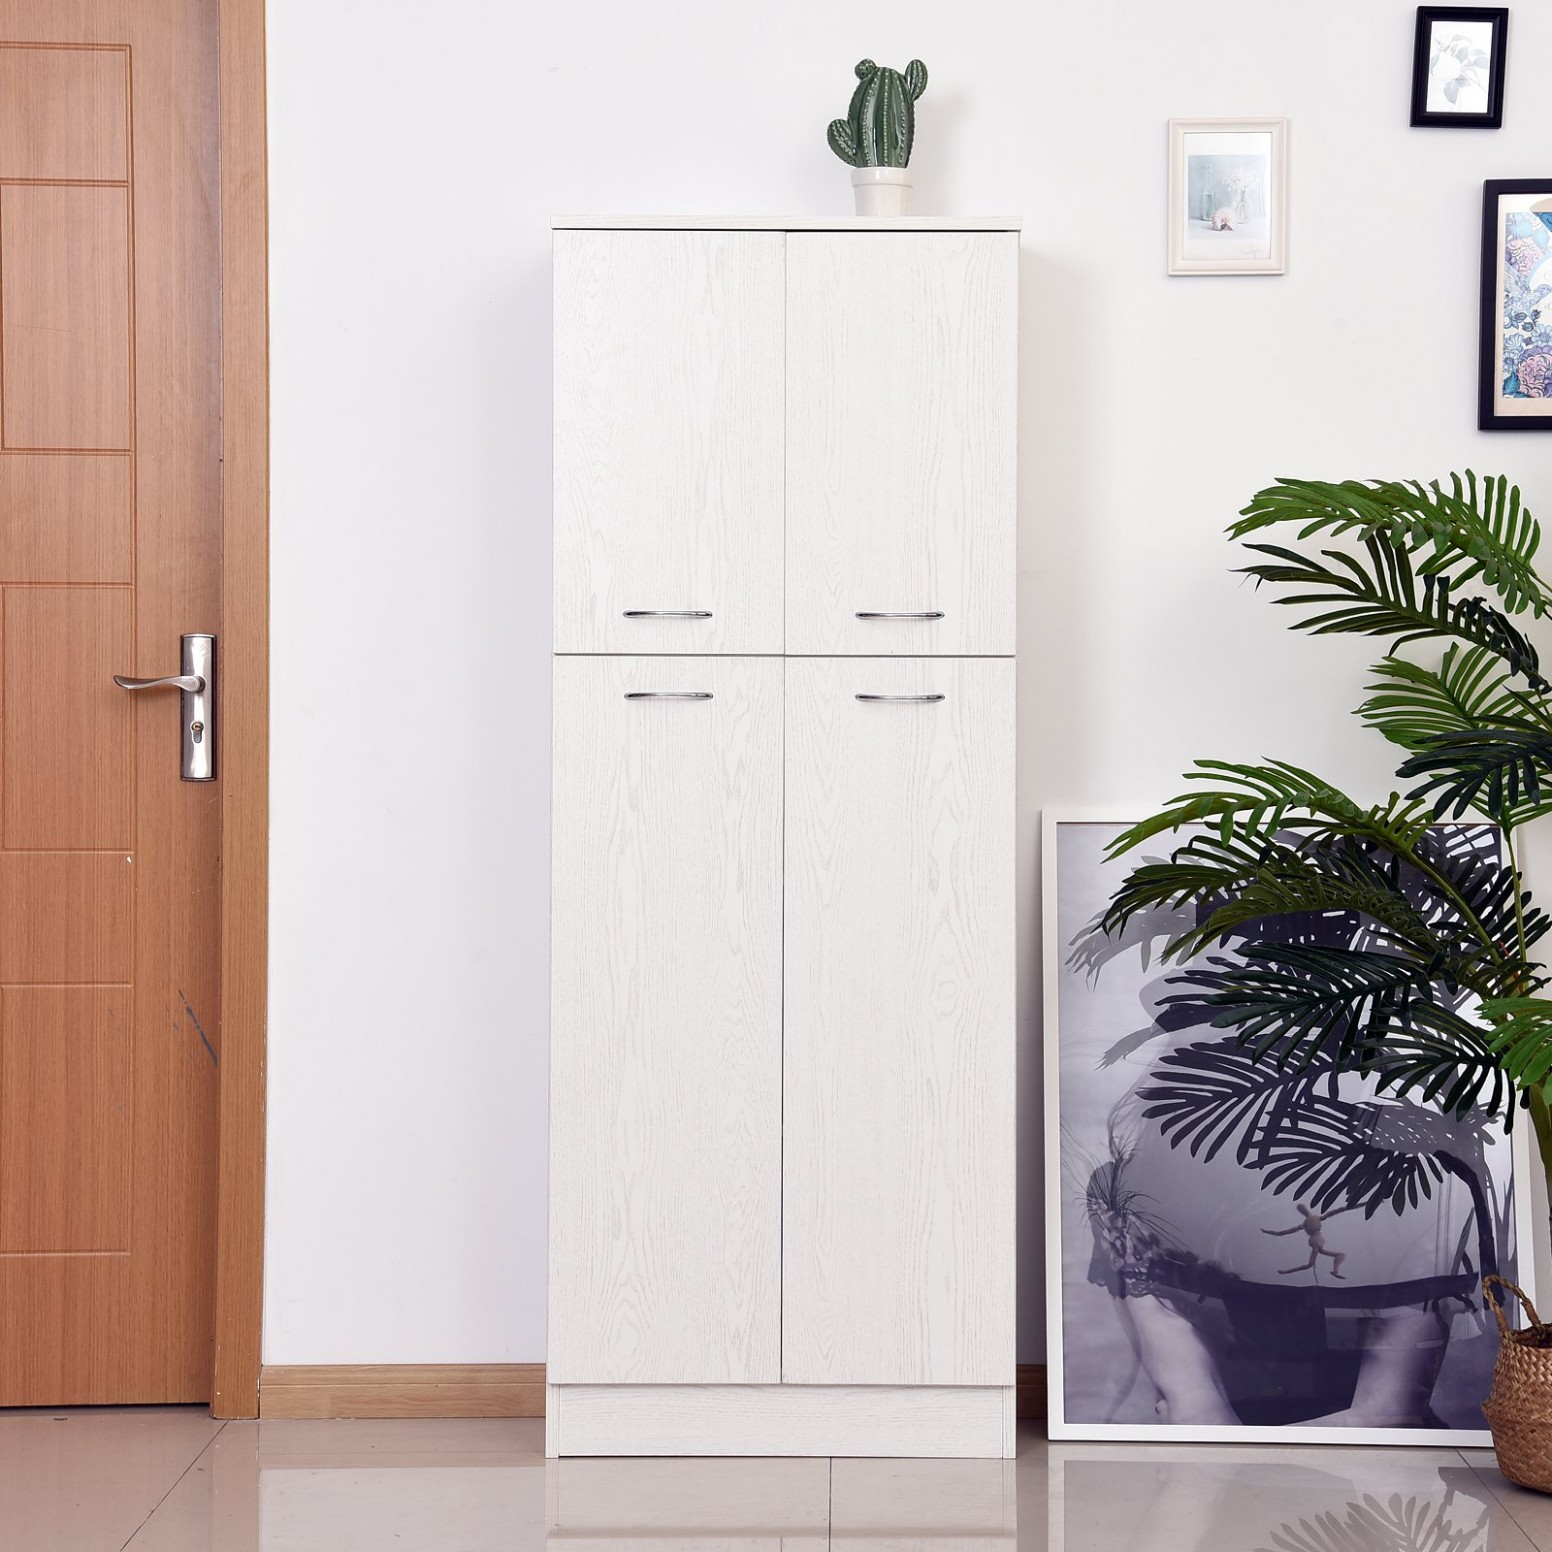 HOMCOM 11 Inch Tall 11-Door Kitchen Pantry Cupboard Storage Cabinet with  Adjustable Shelves Home Furniture, White - Four Door Kitchen Cabinet